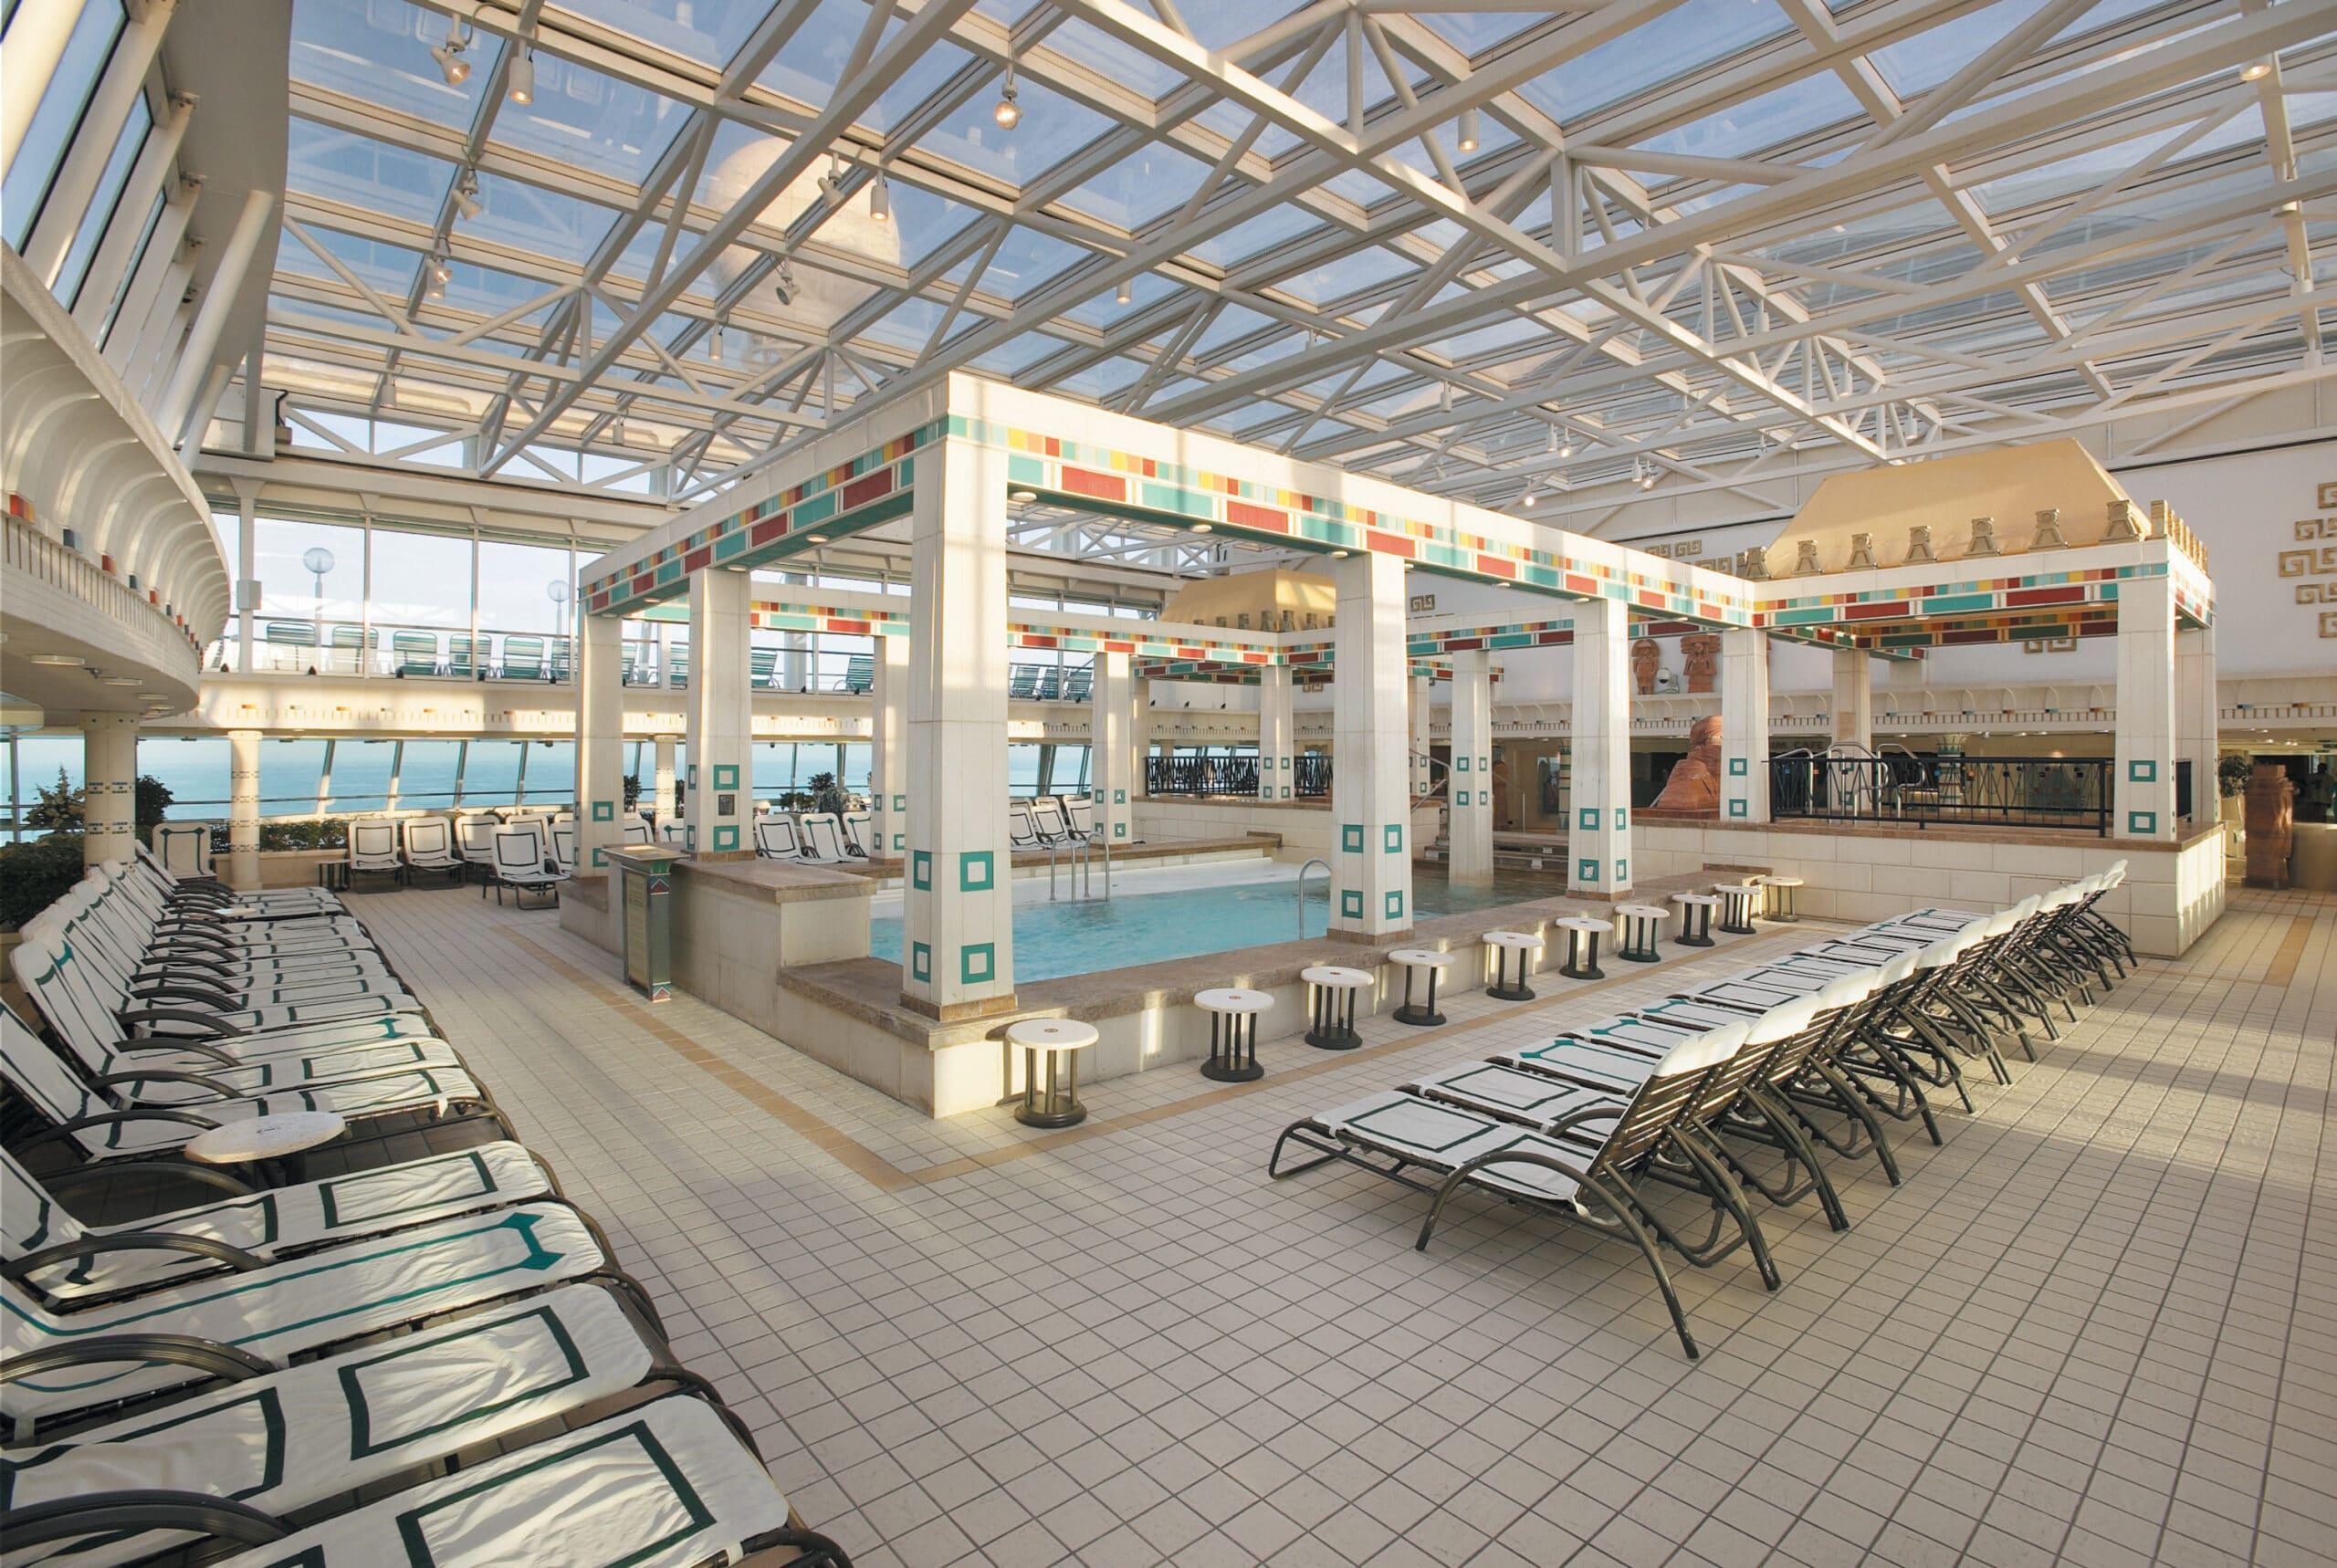 Cruiseschip-Vision of the Seas-Royal Caribbean International-Binnenzwembad